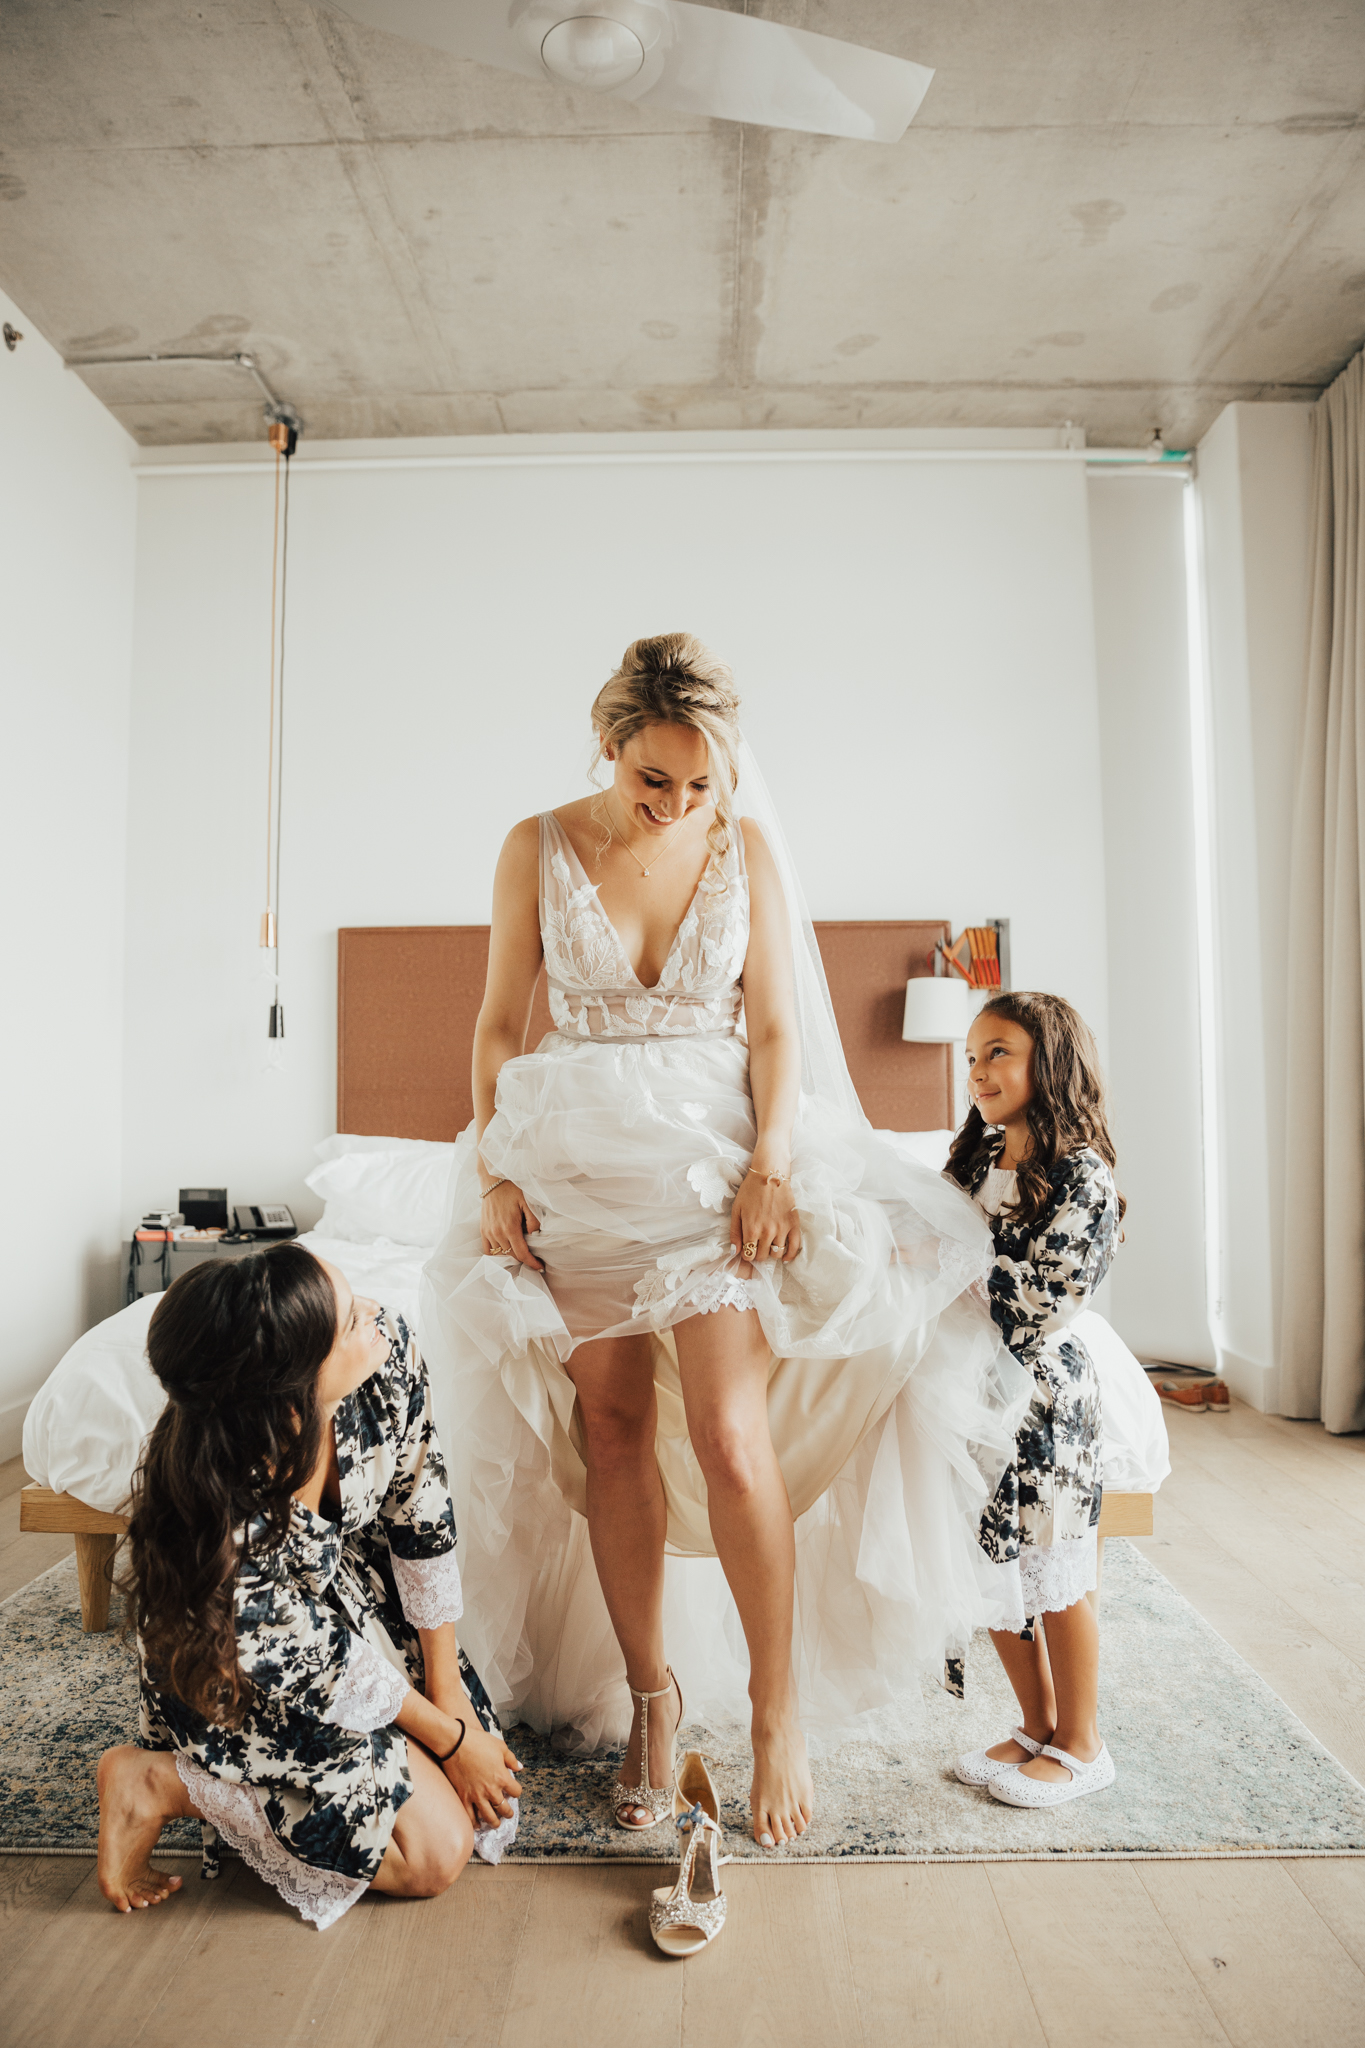 flower girl helping bride